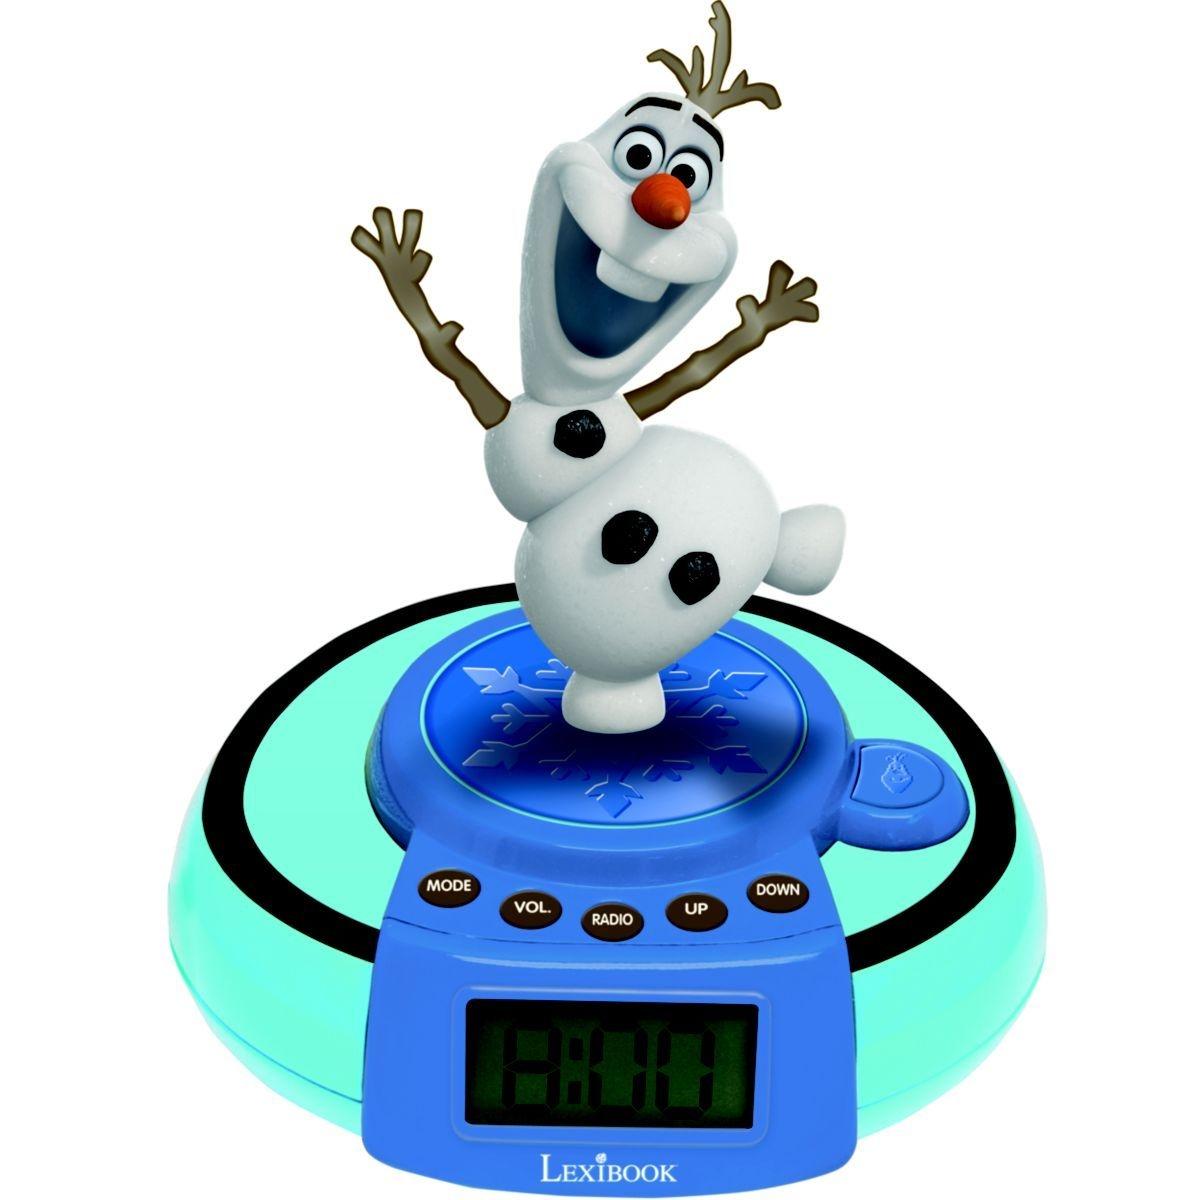 Réveil enfant LEXIBOOK Projecteur Jumper Olaf